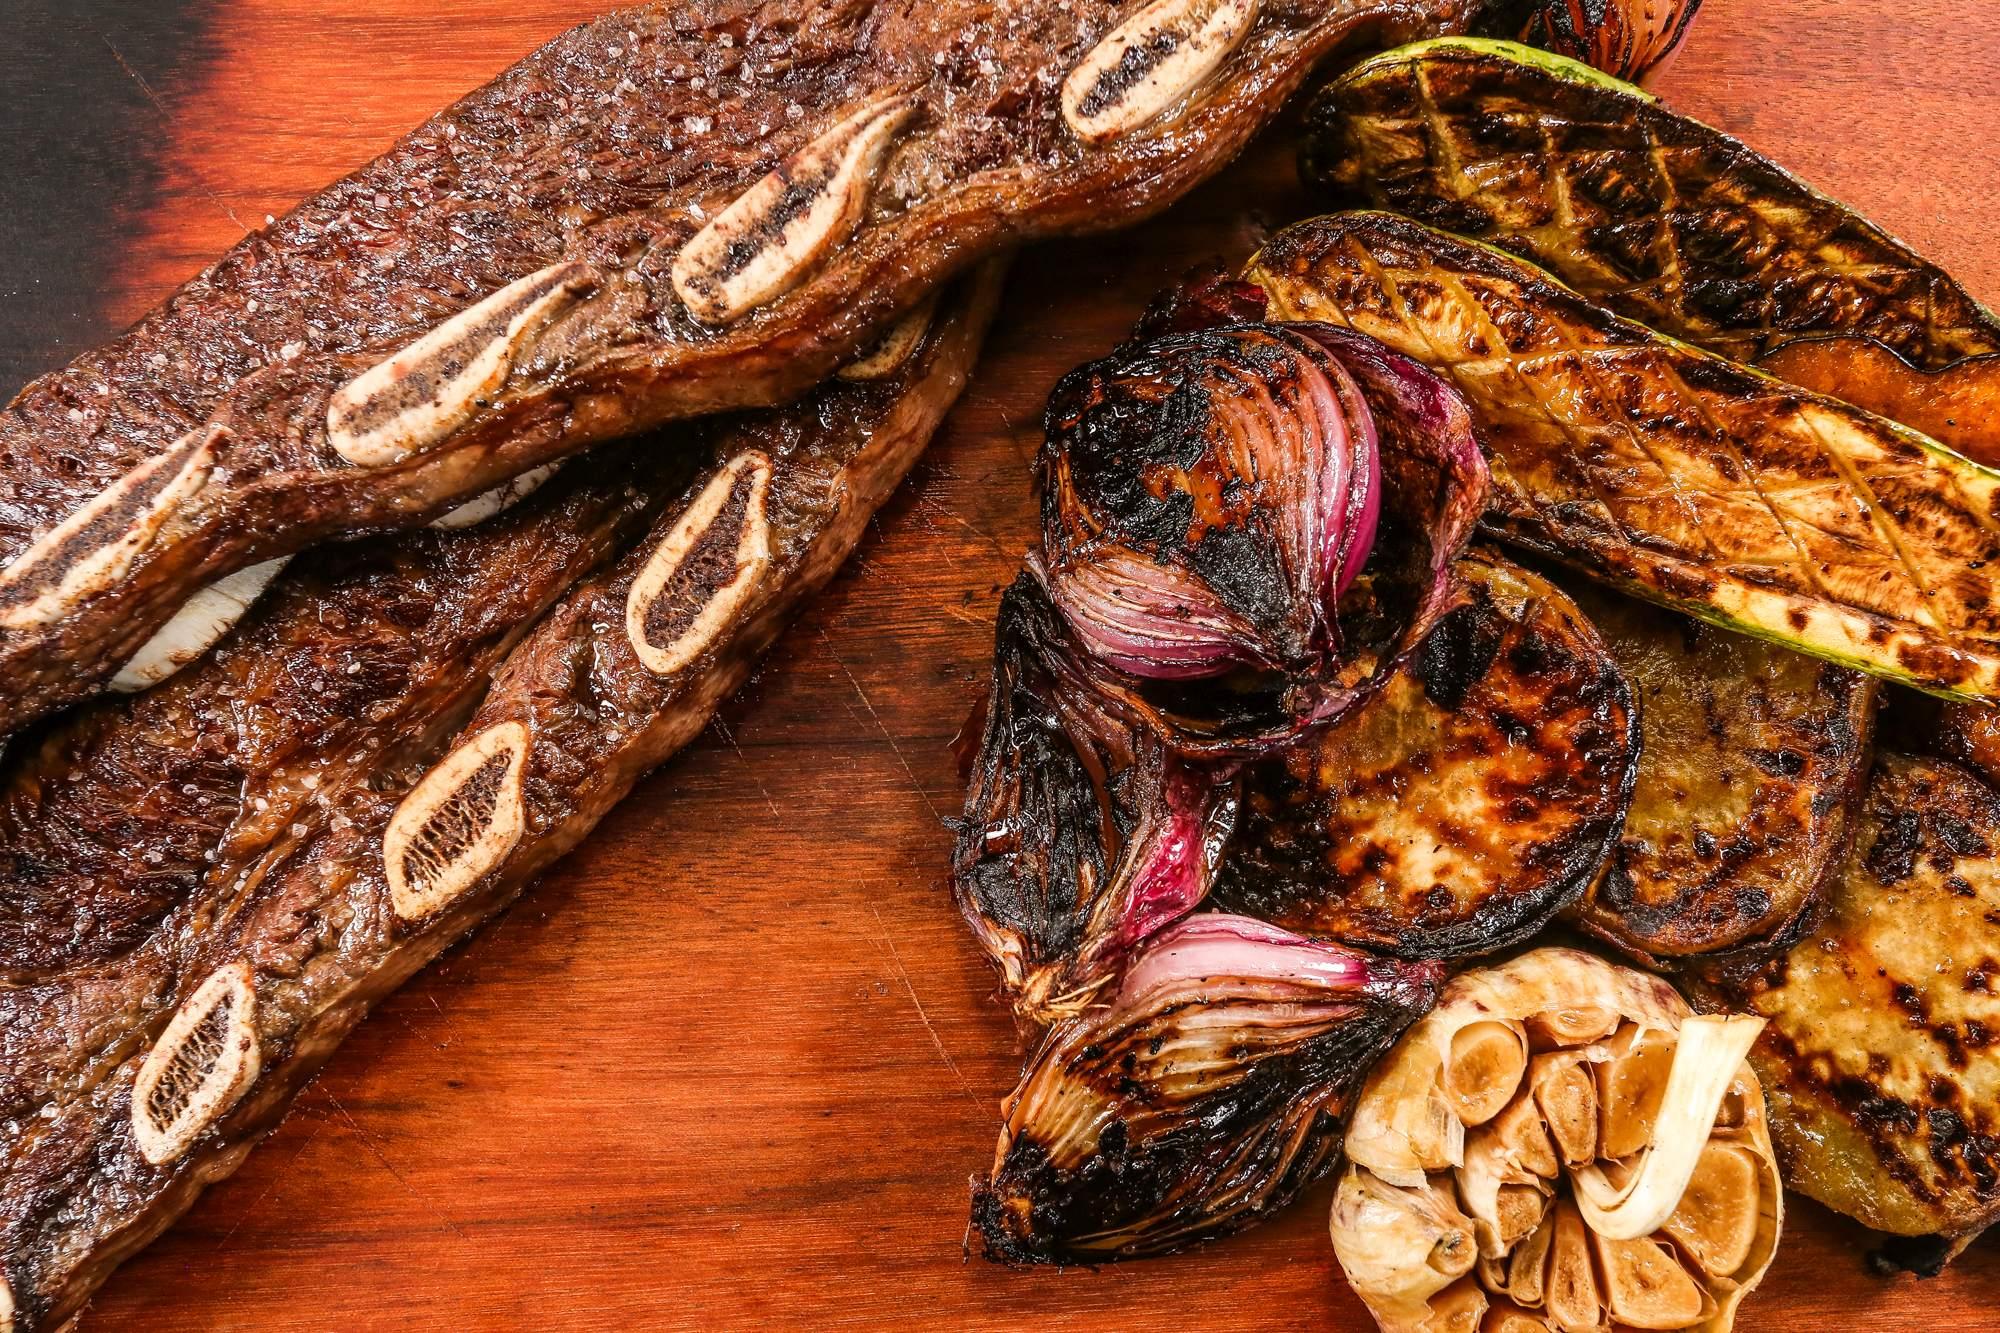 Mercadoteca terá menu especial de preparos na brasa